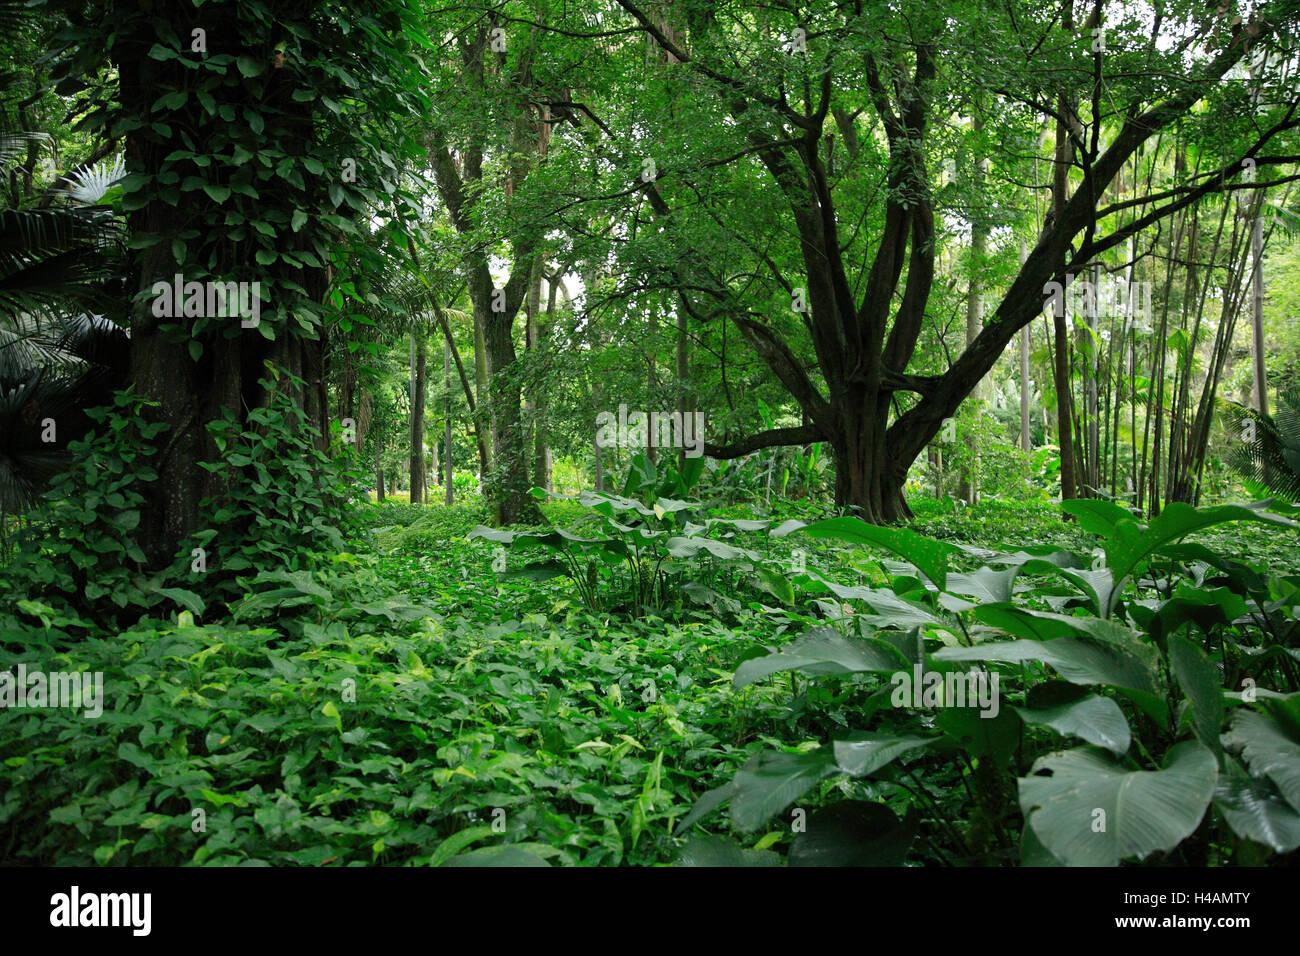 Brazil, Rio de Janeiro, botanical garden, primeval forest, South America, destination, place of interest, garden, - Stock Image